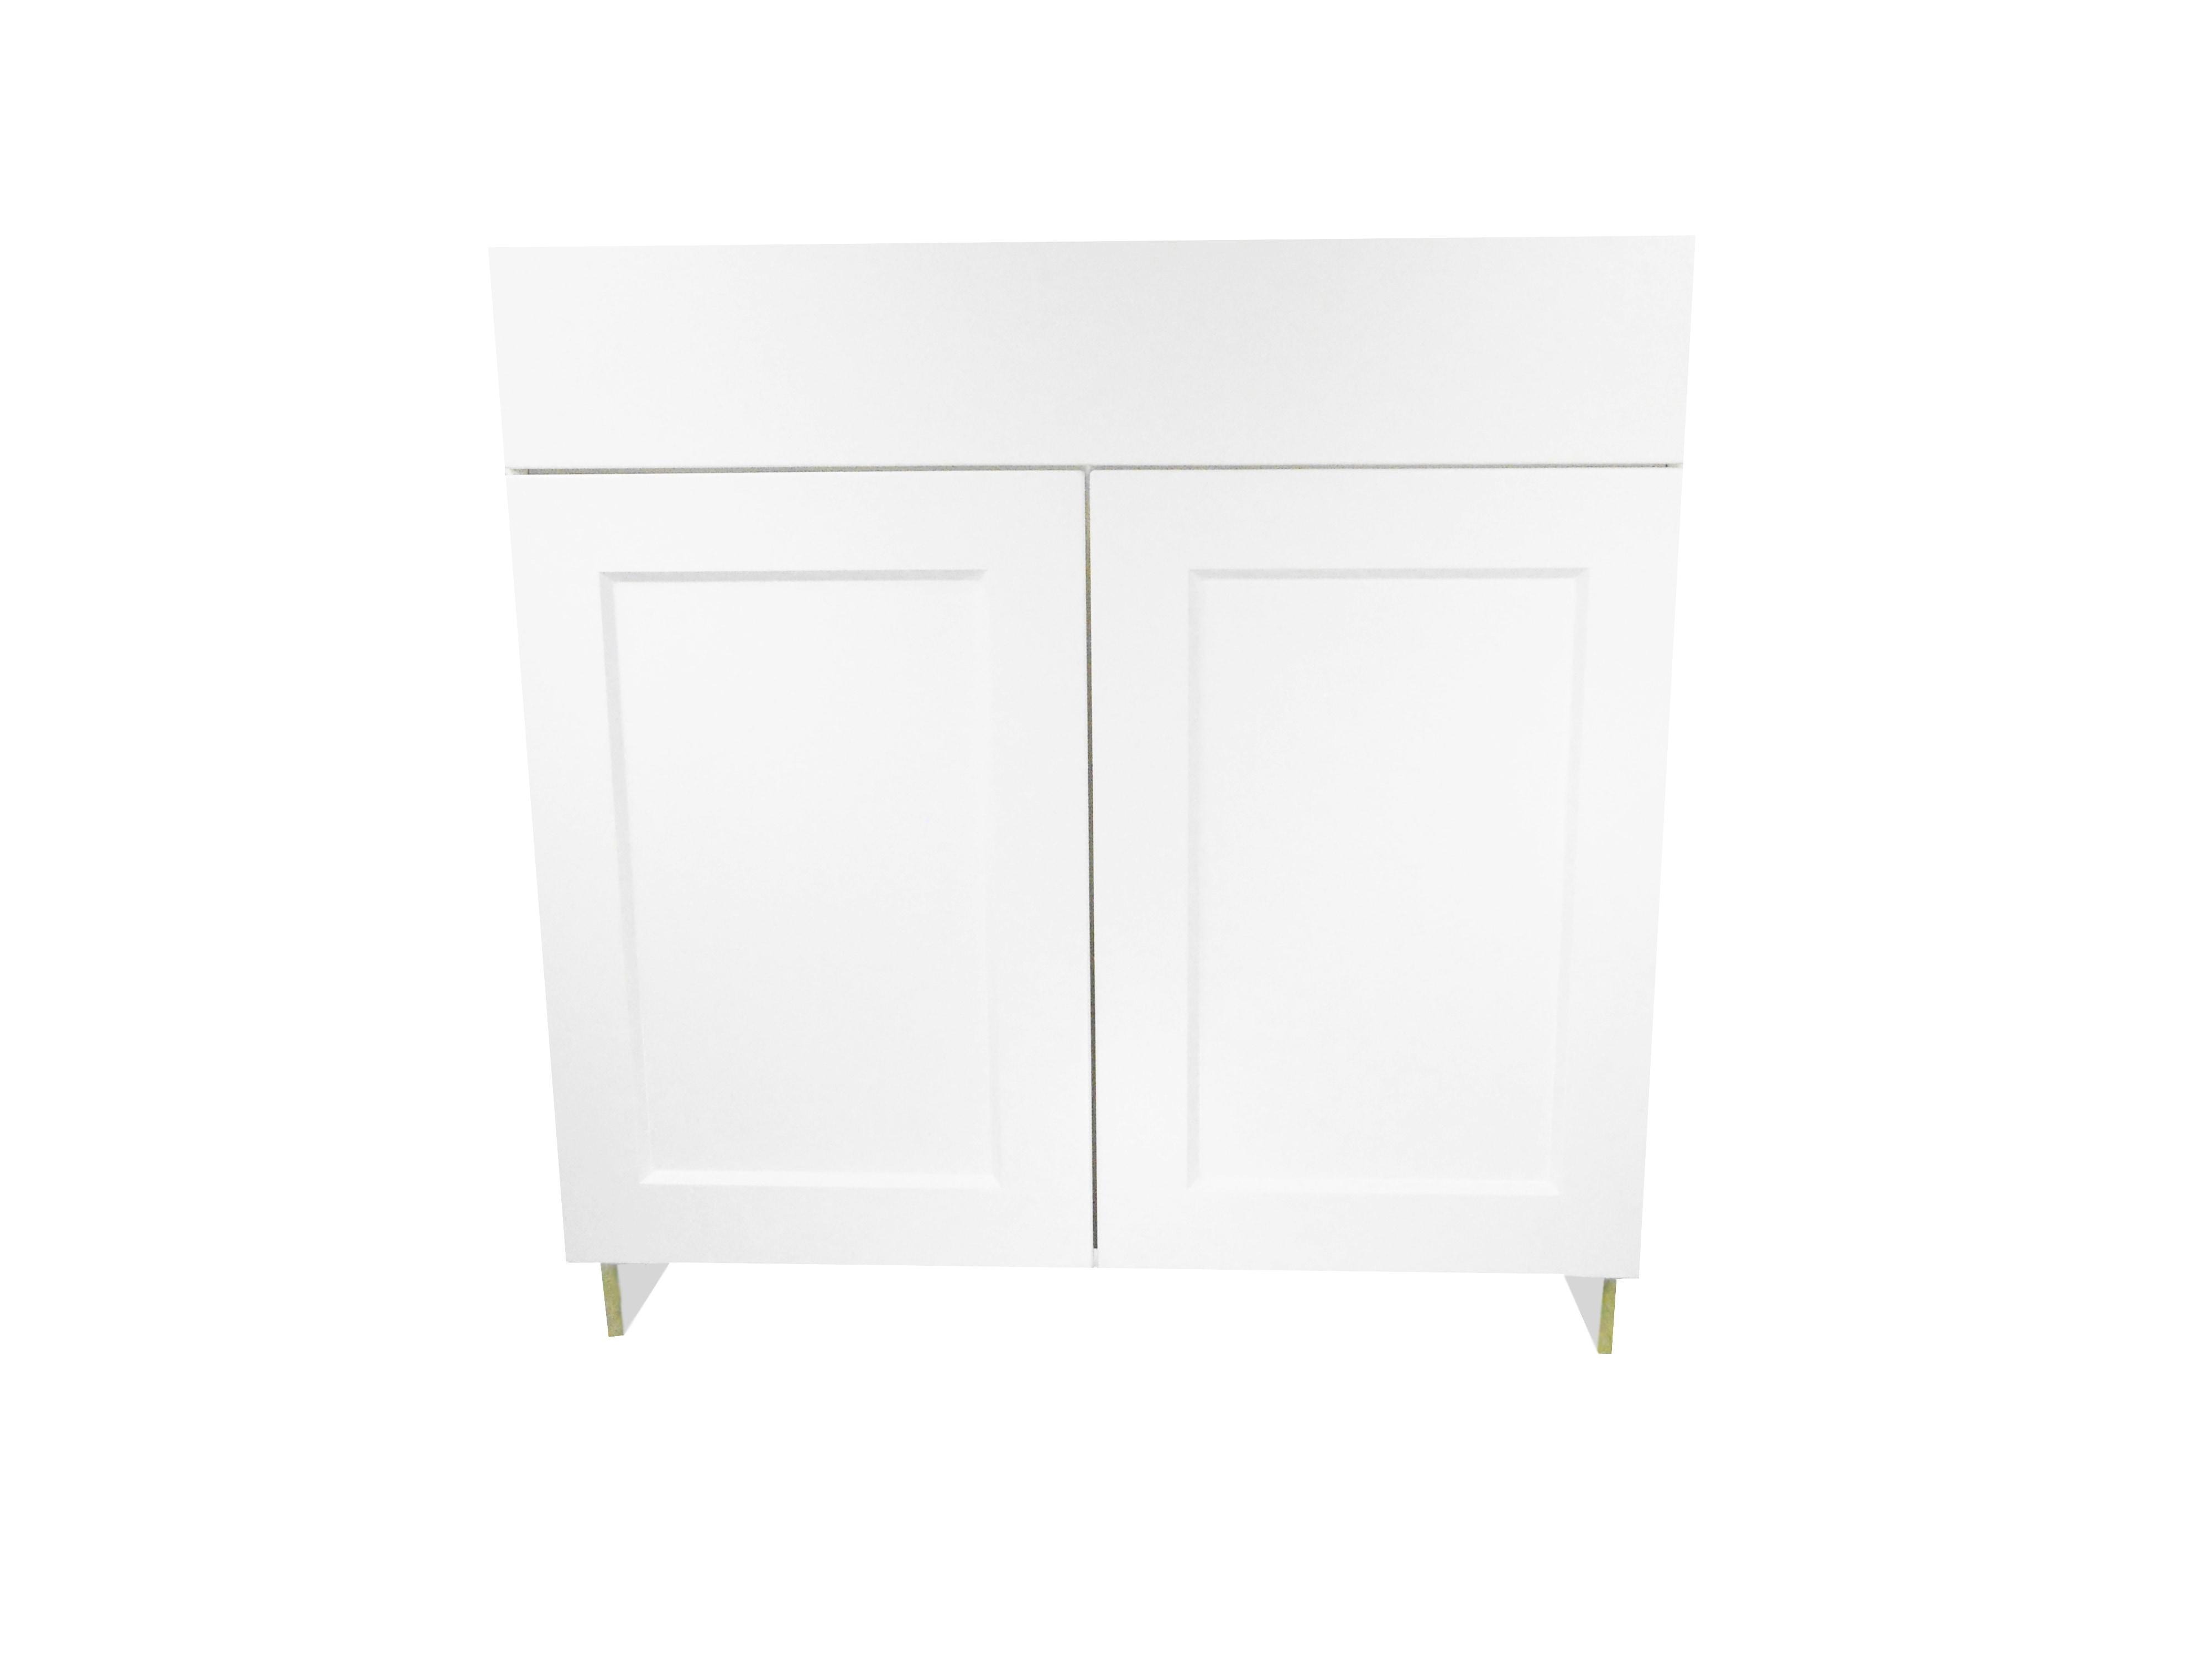 Base Cabinet with Drawer/2 Door / Wistler White / Flat Panel White / 30 Whistler White 0